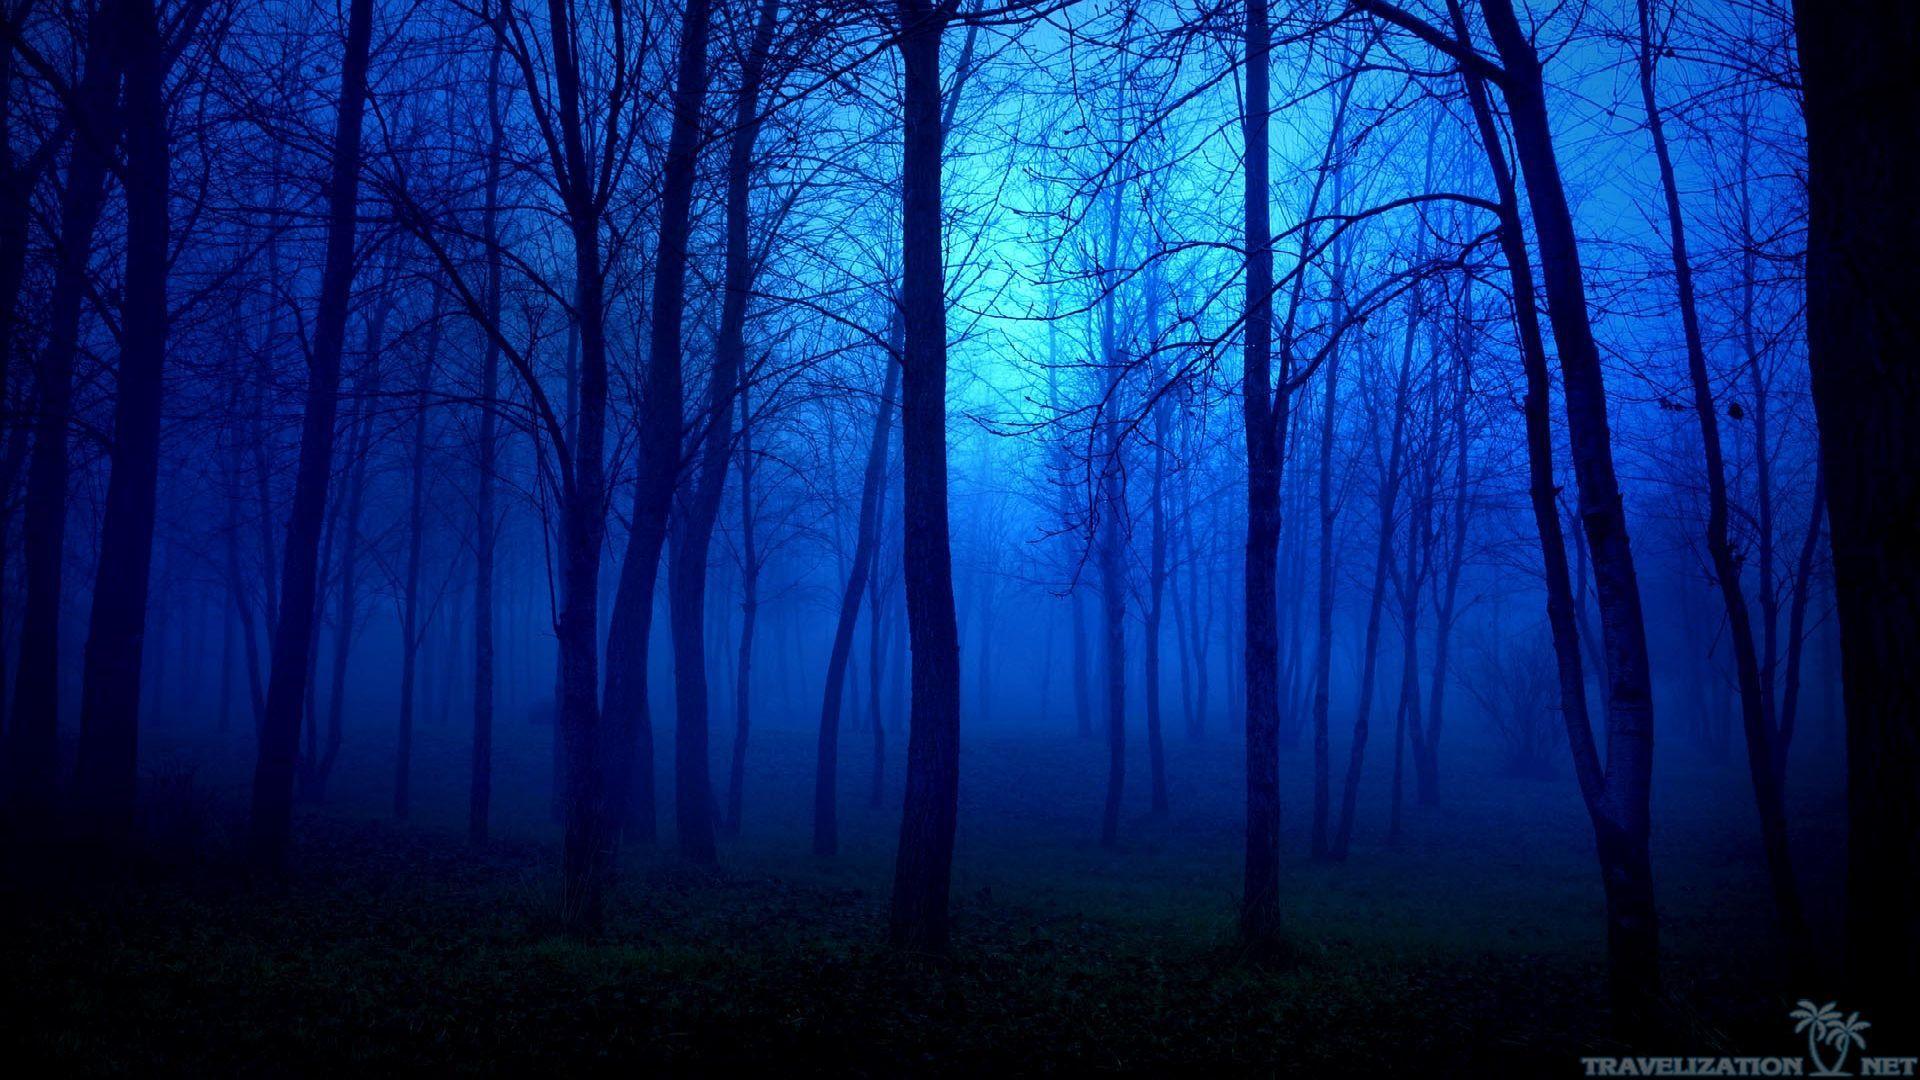 Dark Forest Wallpaper 24 Free Hd